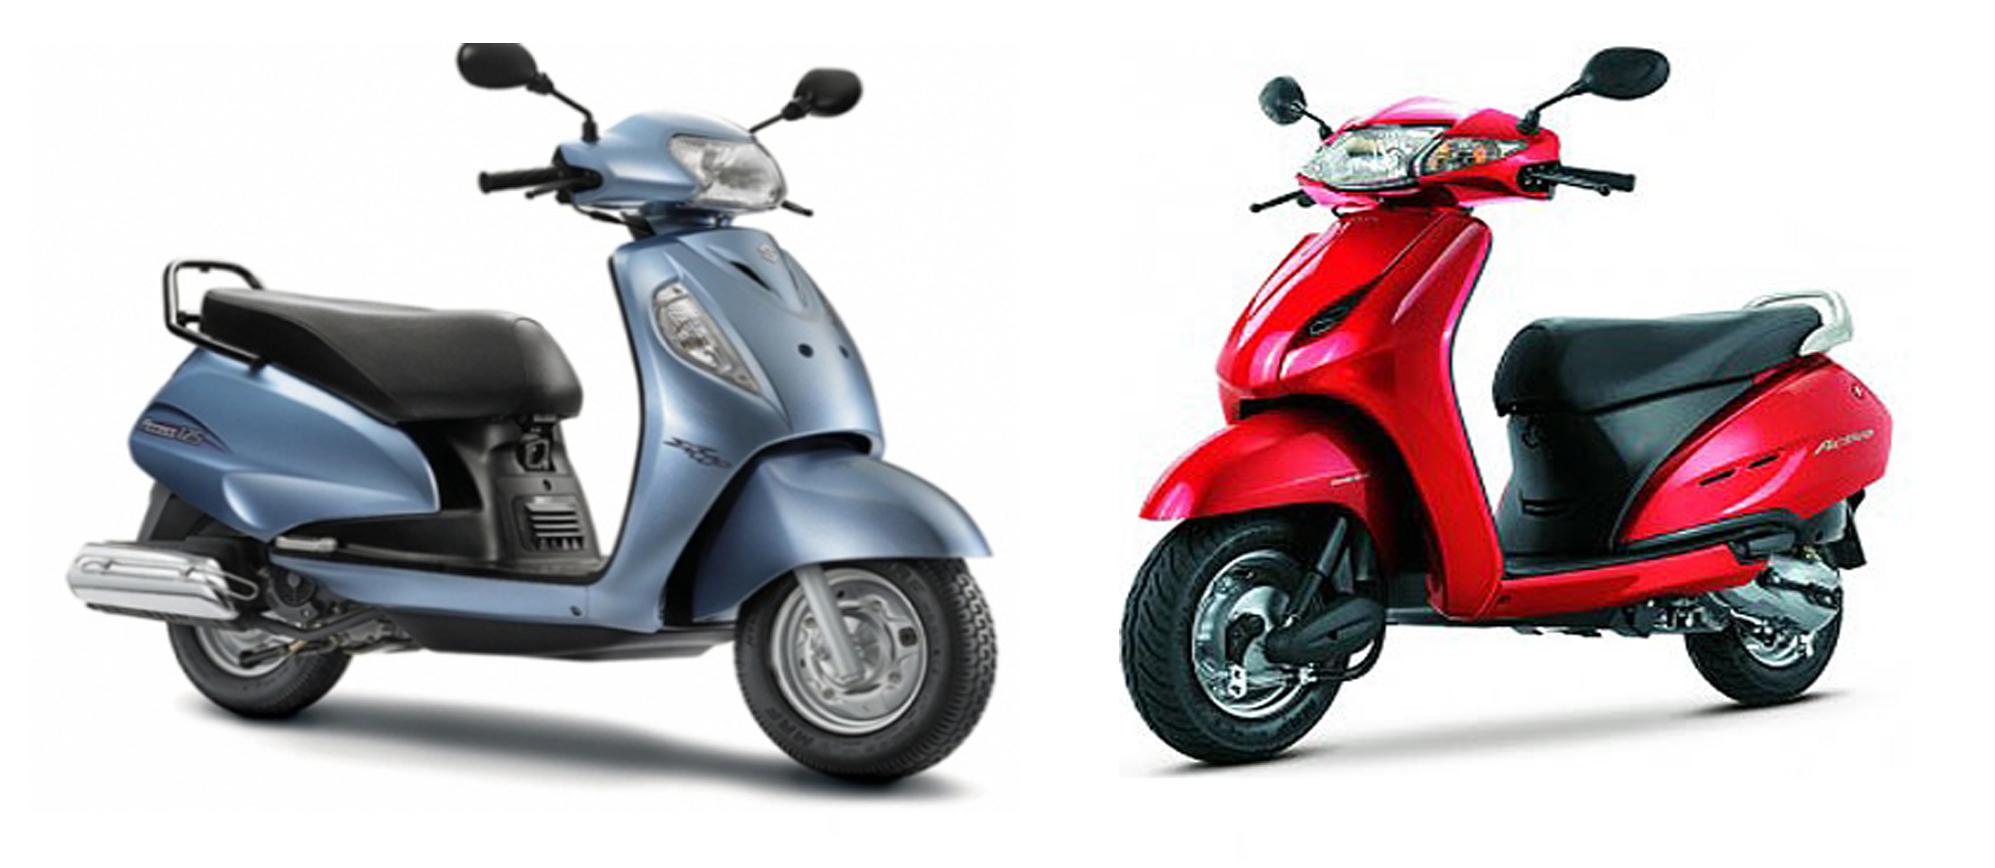 Honda Activa New Model Colours